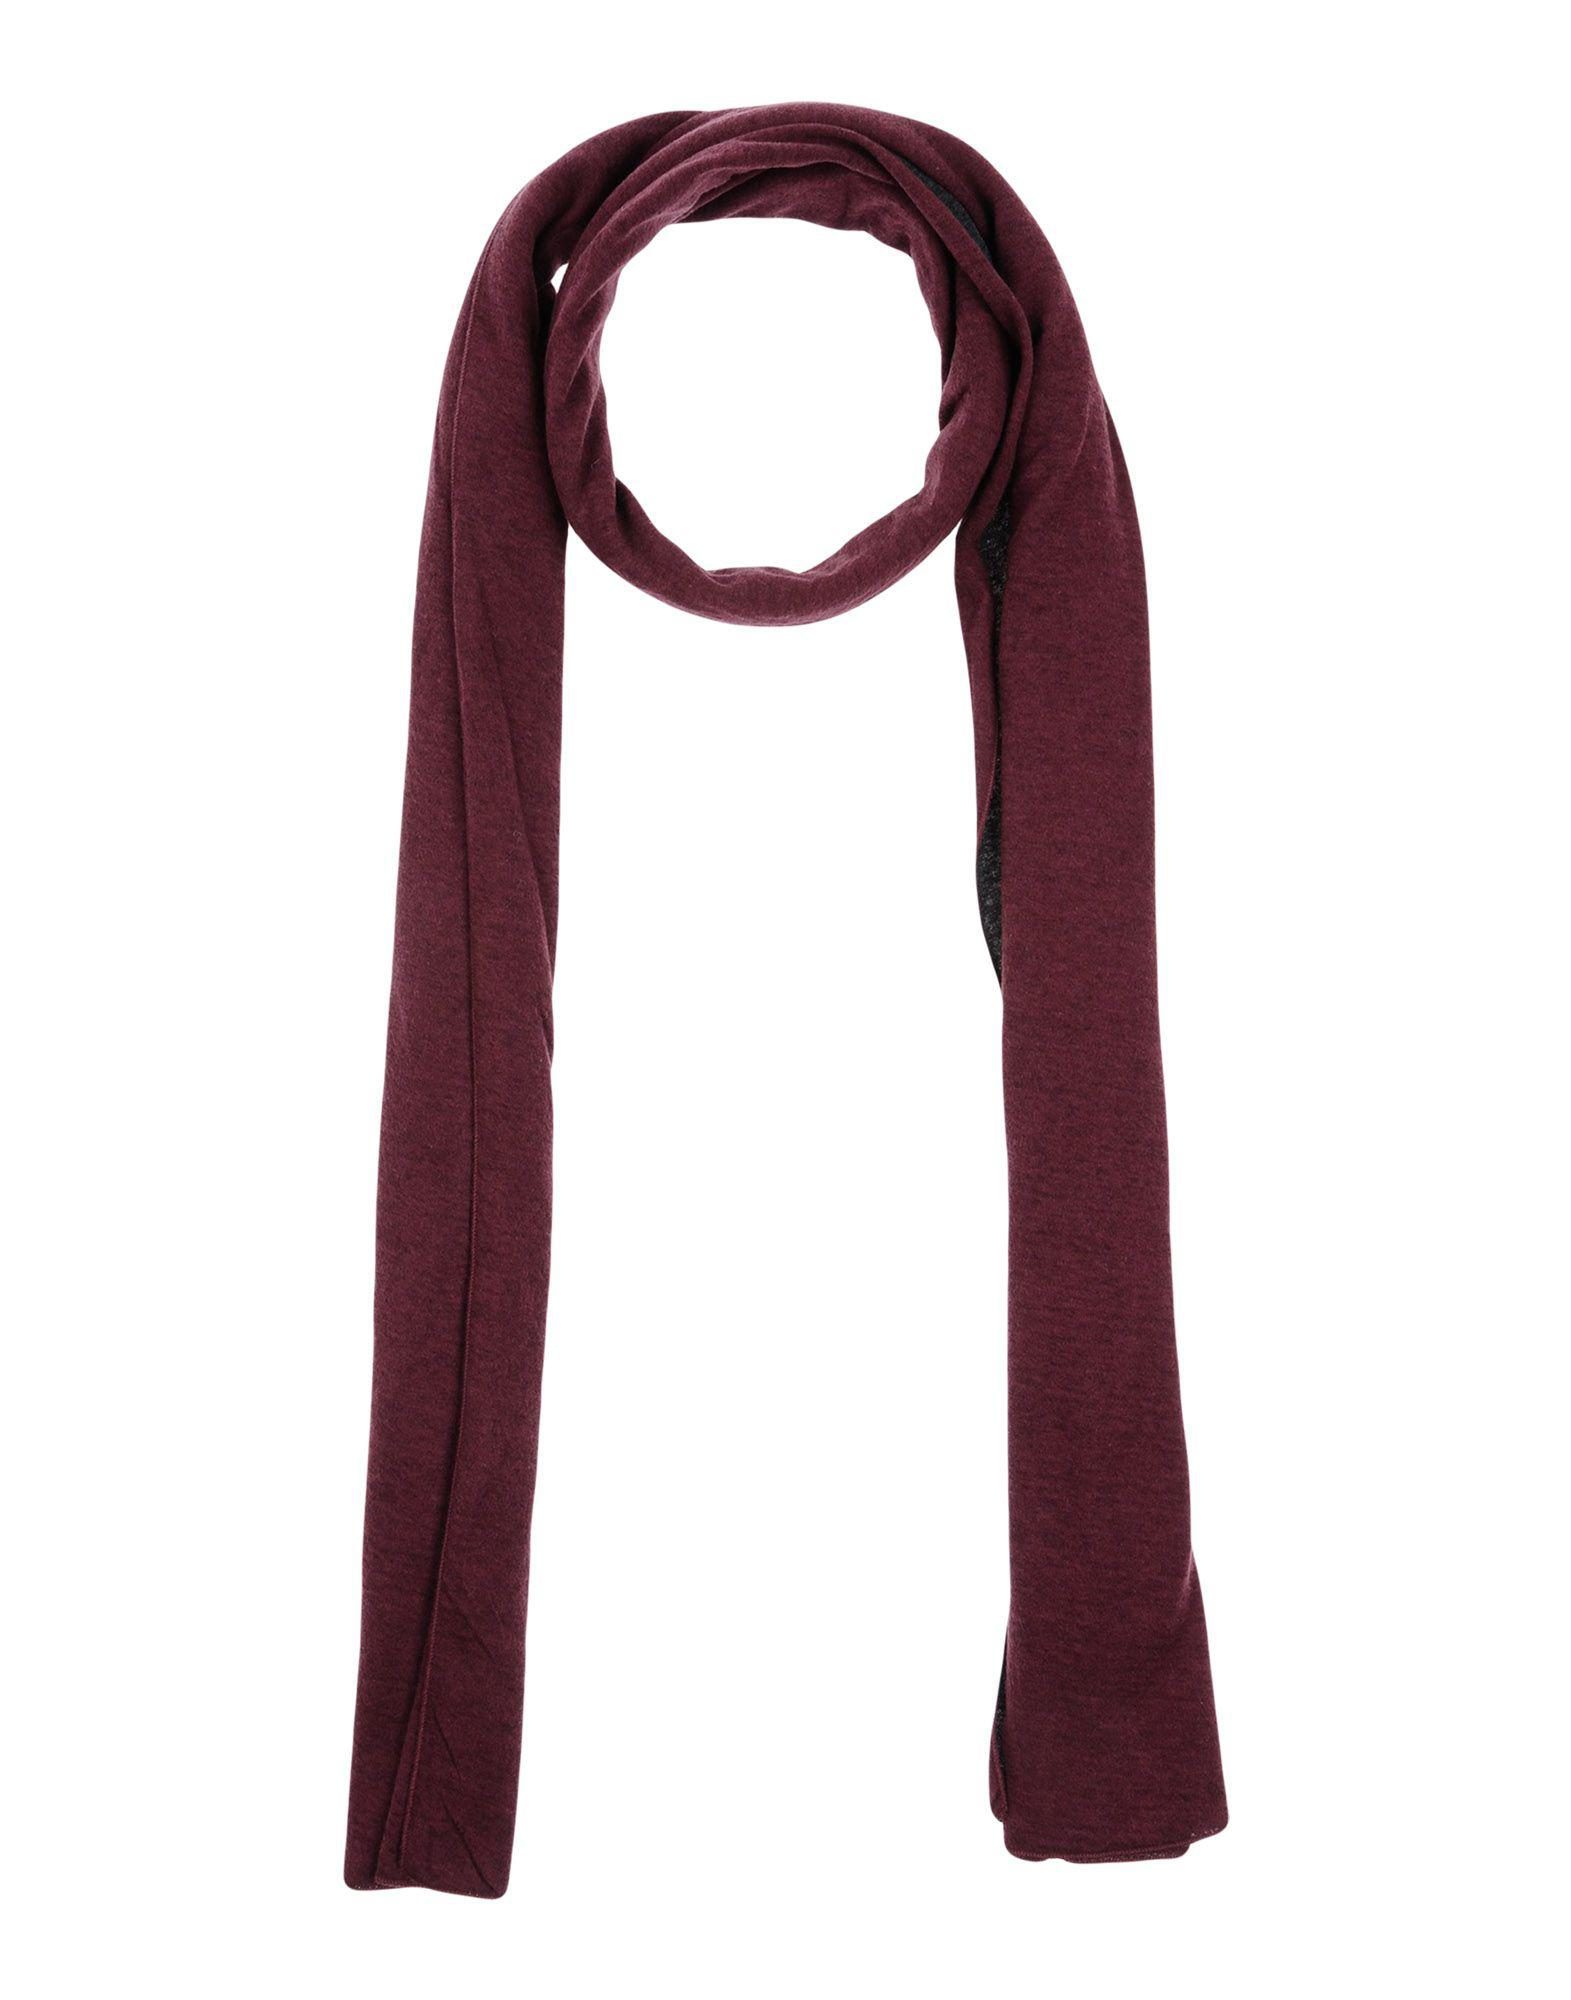 Accessories - Scarves Brebis Noir RKSs3On6Tv